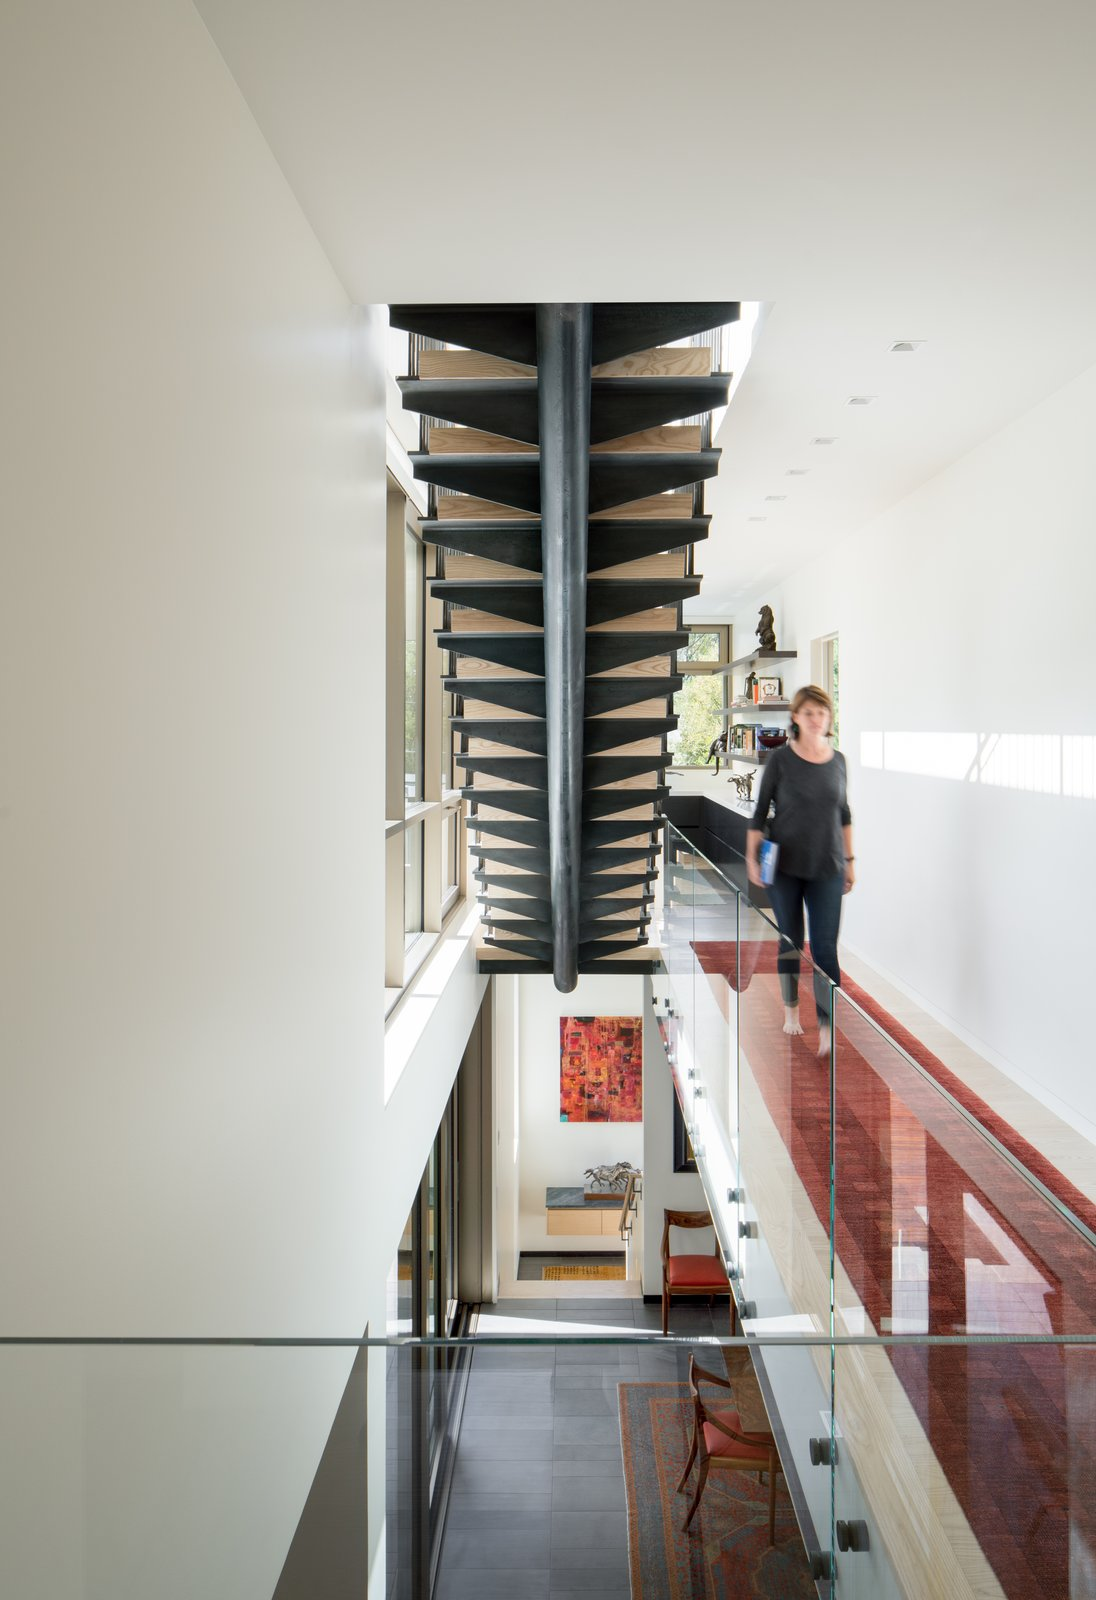 Staircase, Metal Tread, Wood Railing, Wood Tread, Glass Railing, and Metal Railing Stair to Roof  the Duncan Residence